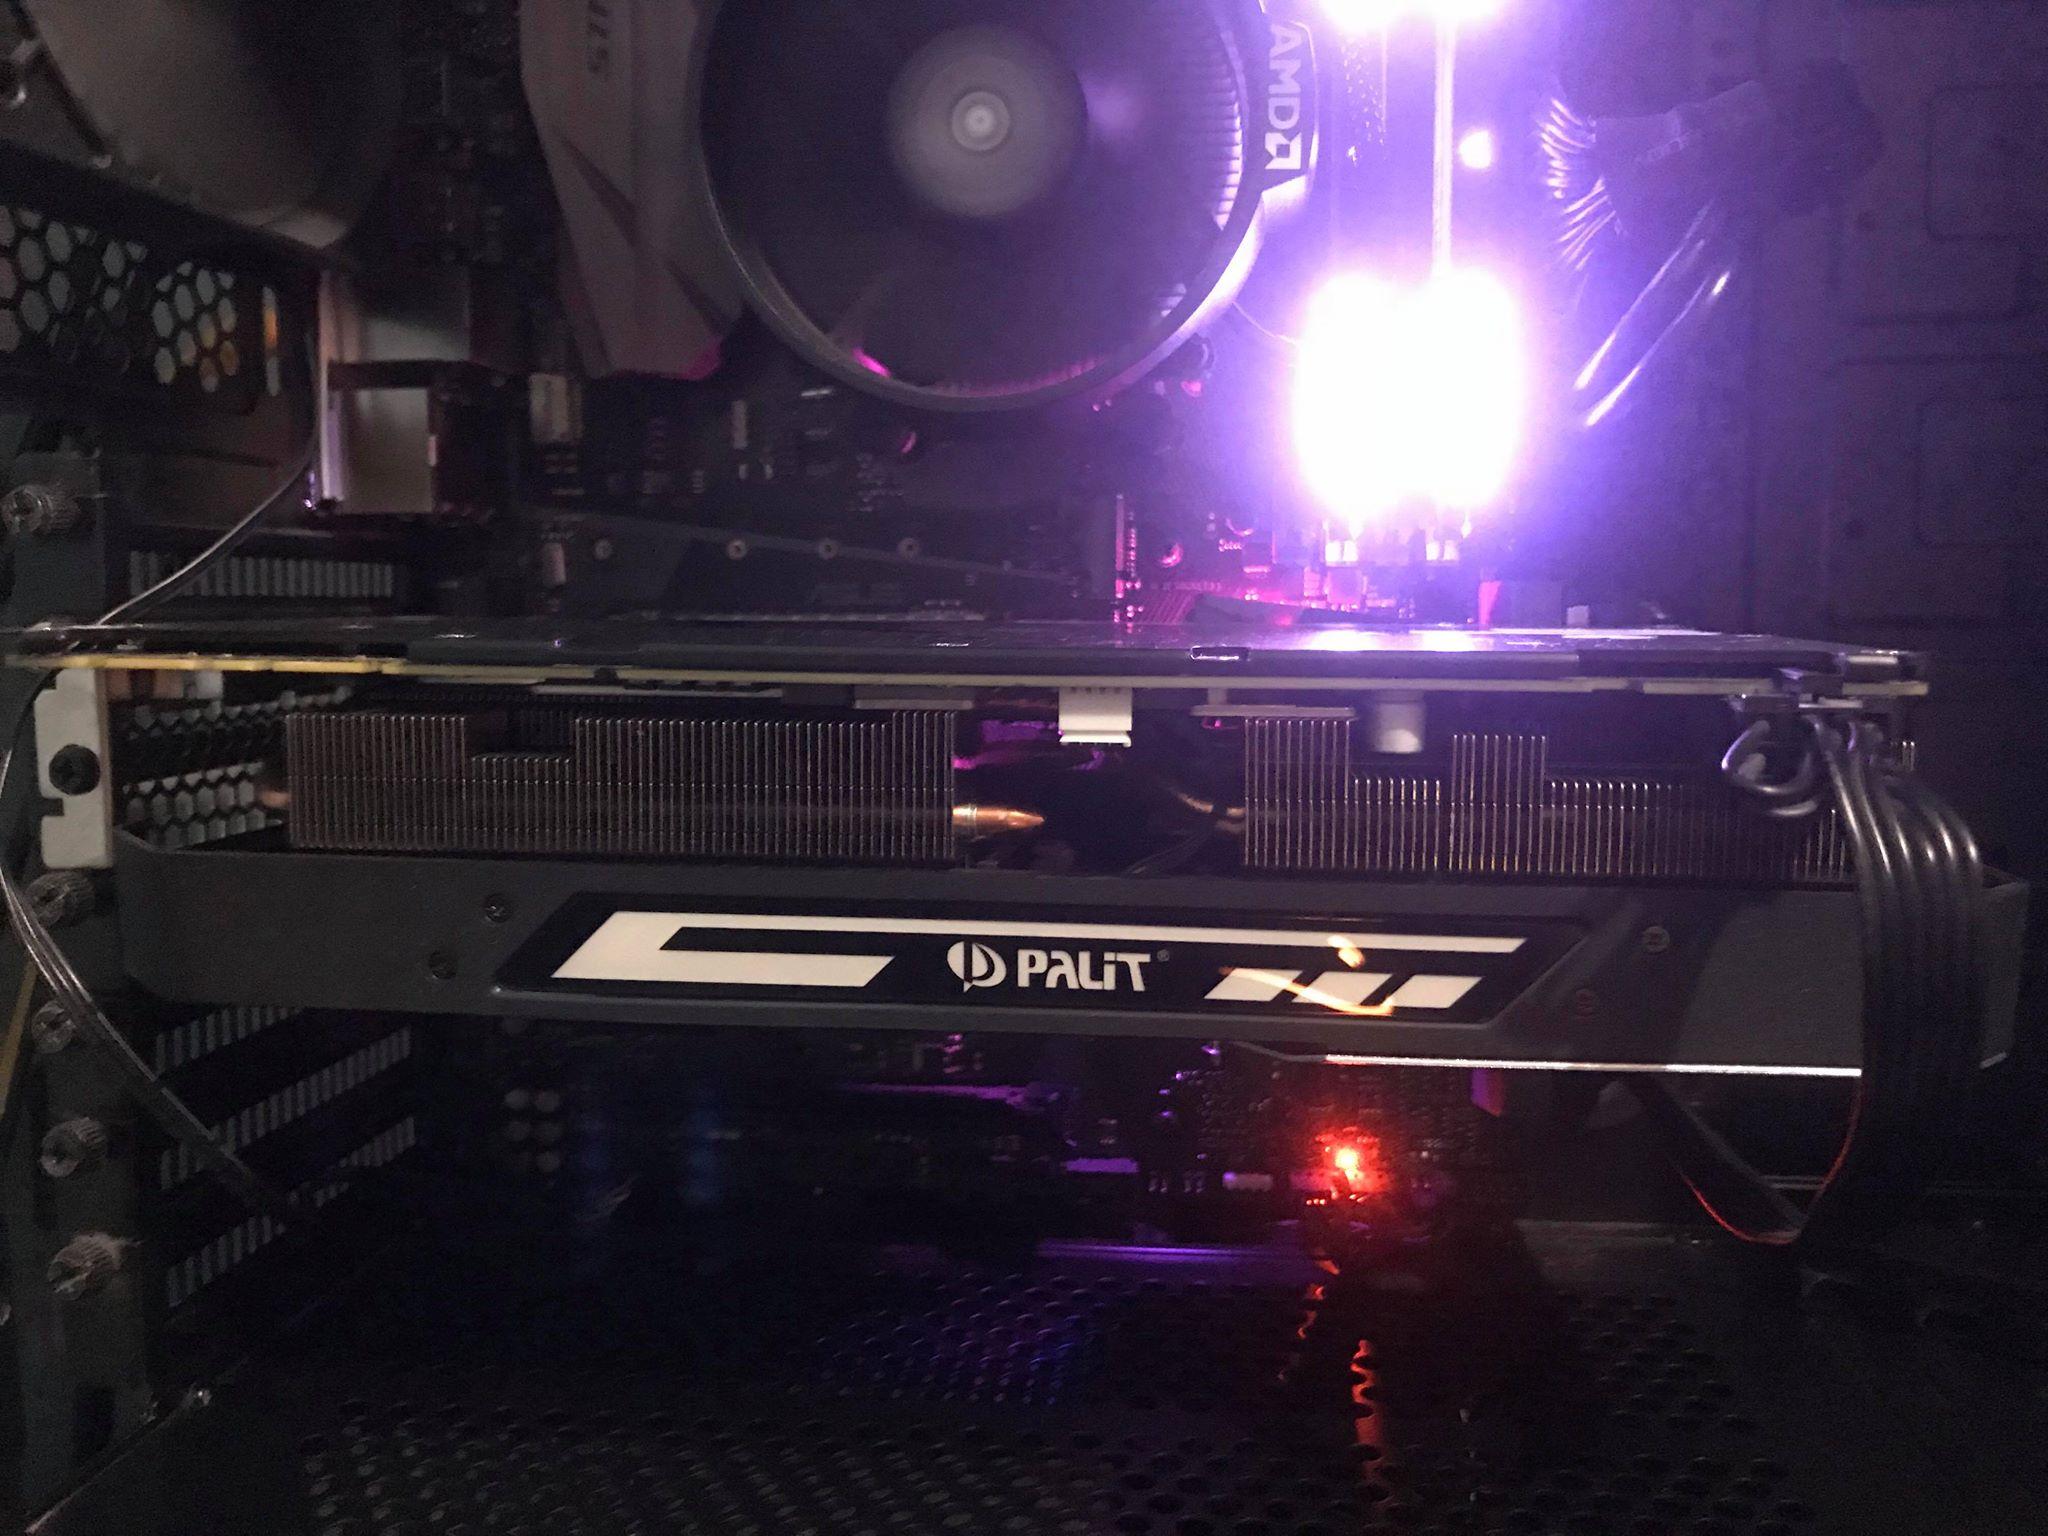 TipidPC com - [SOLD] Palit GTX 1070 Super Jetstream (T> MSI